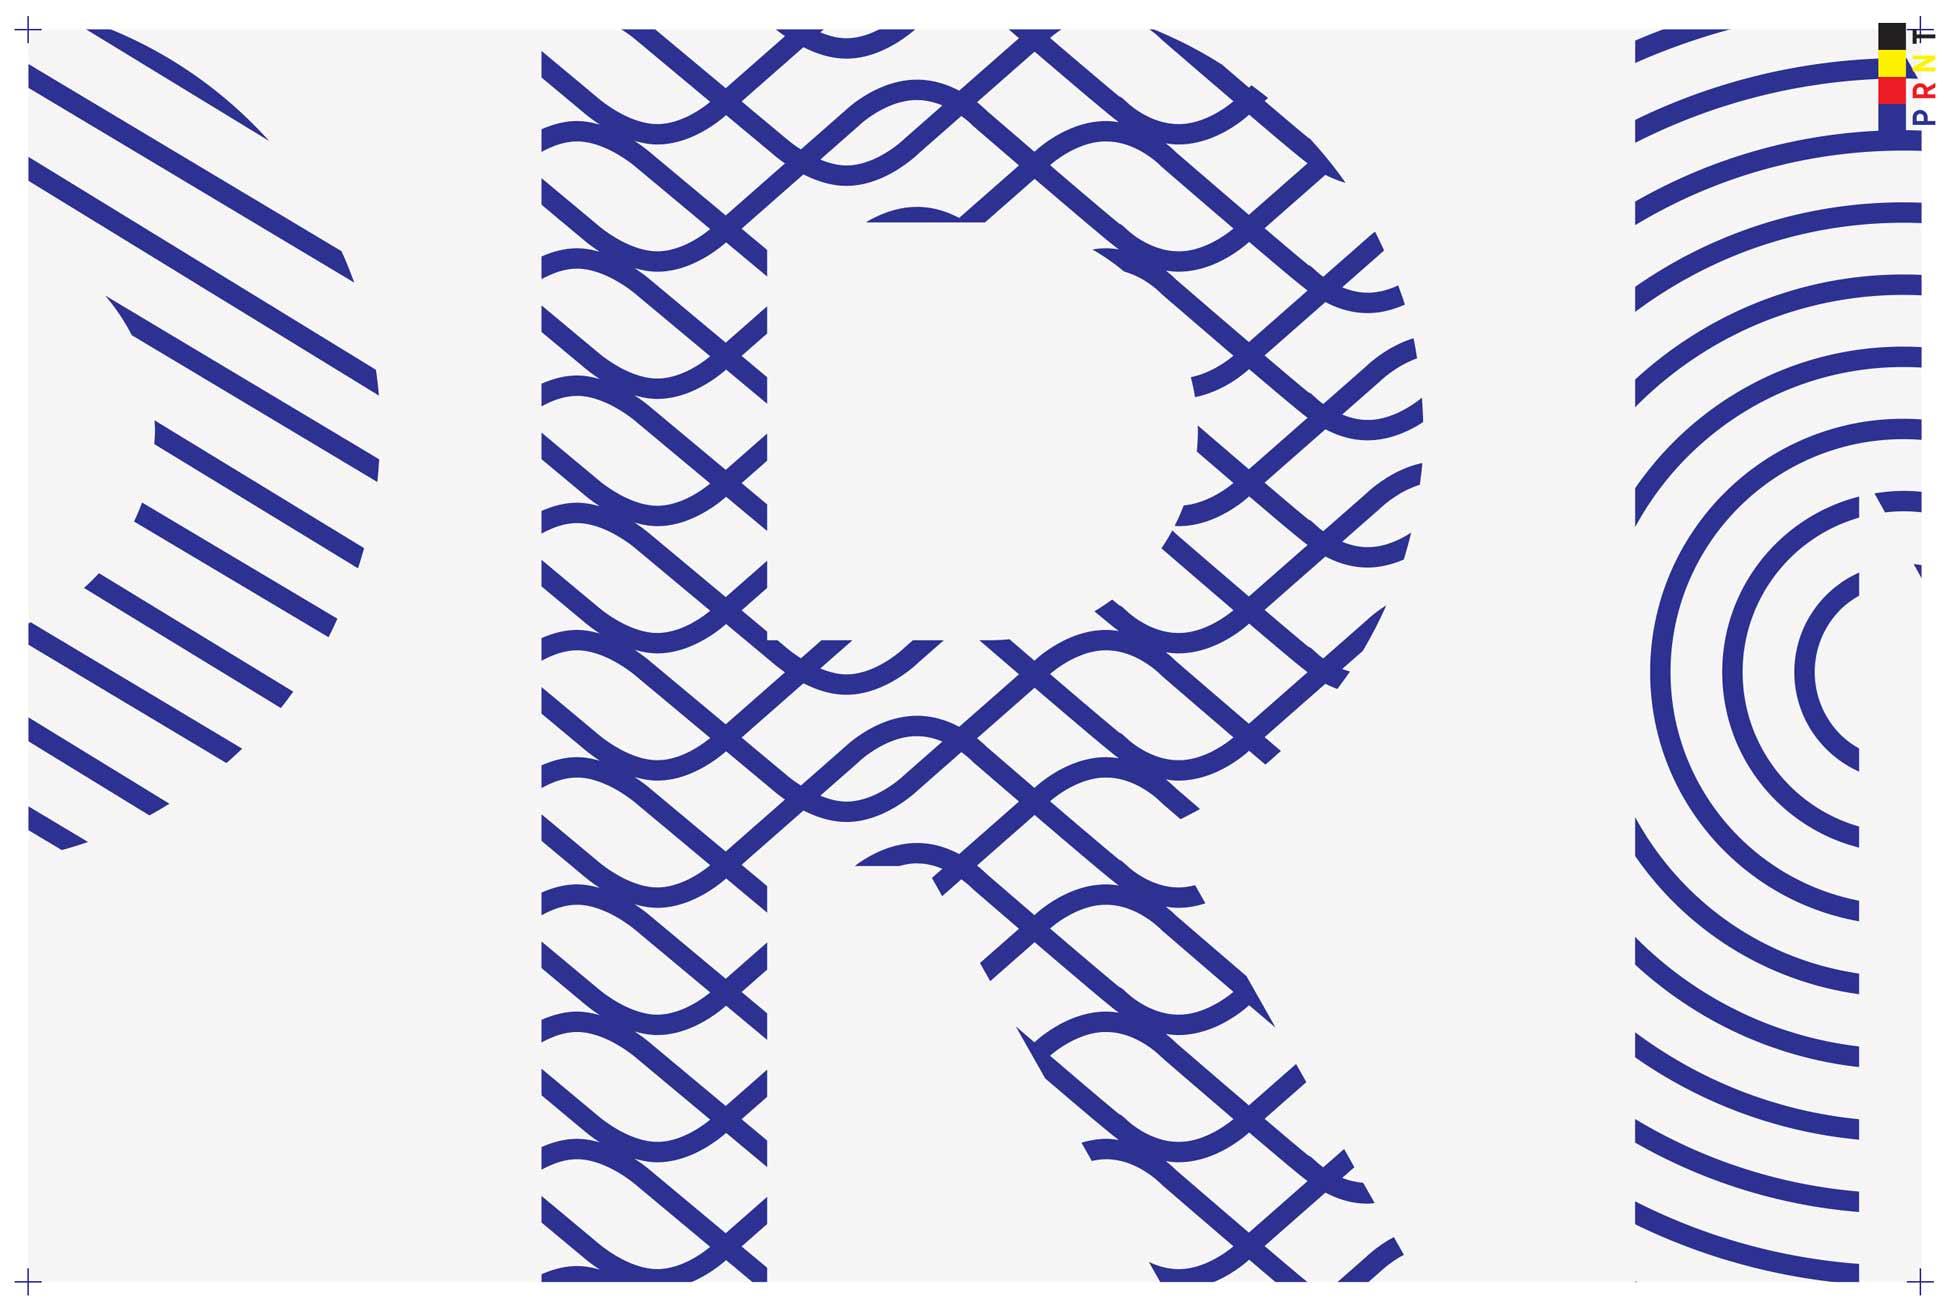 PRNT_type-pattern-detail.jpg